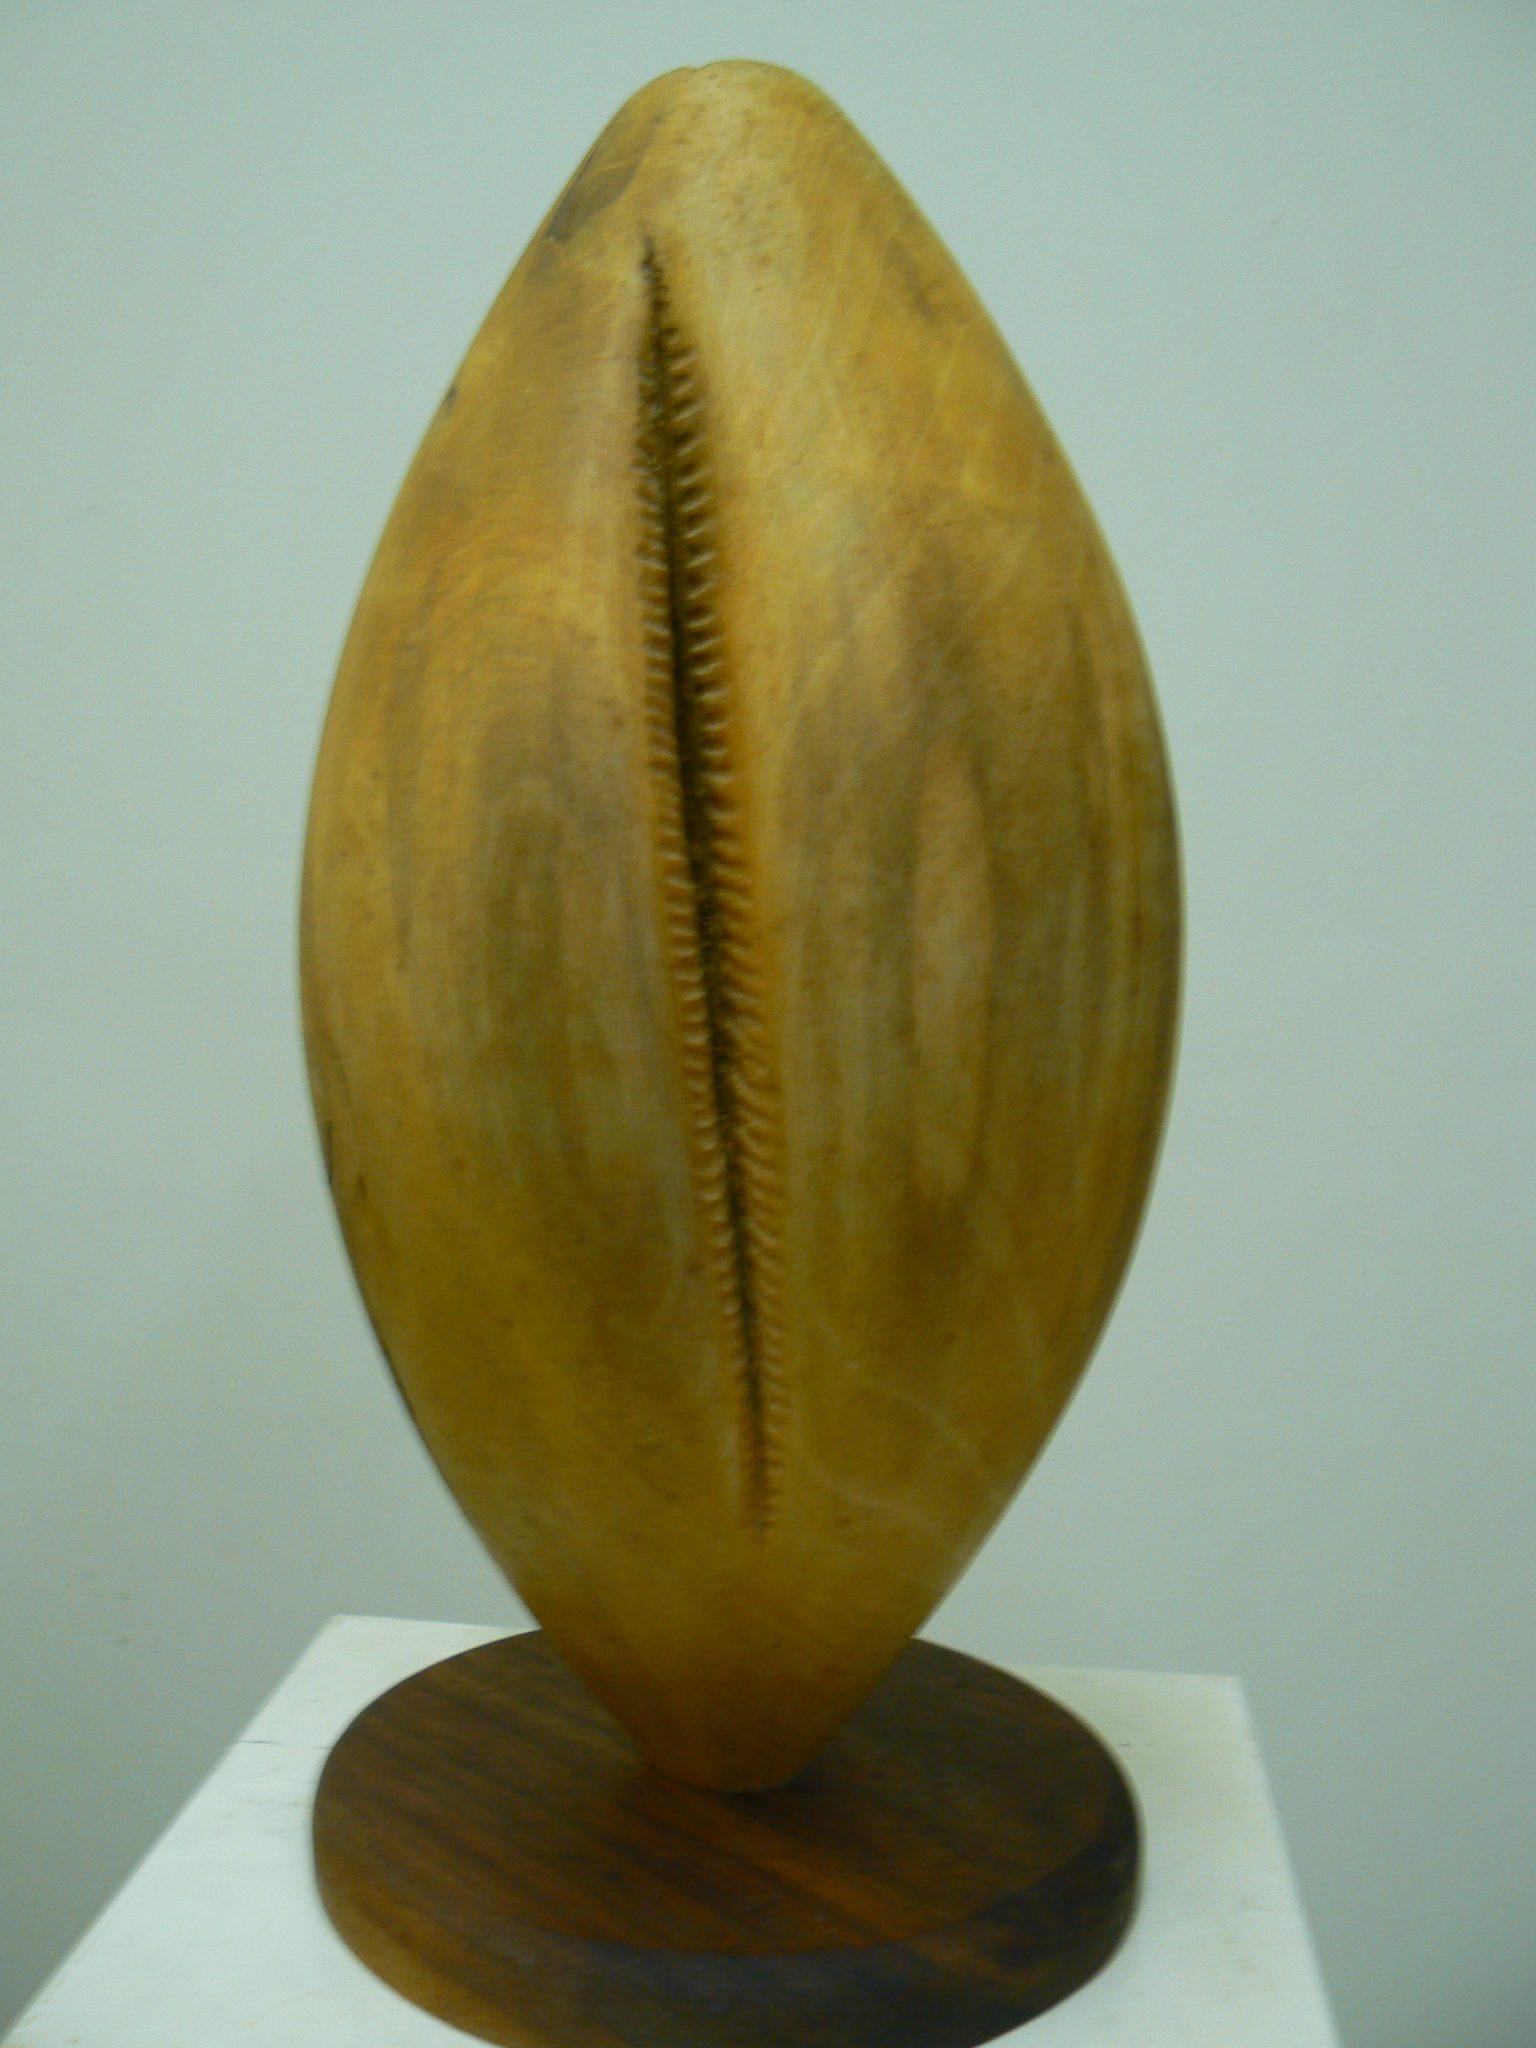 Football, Holly wood